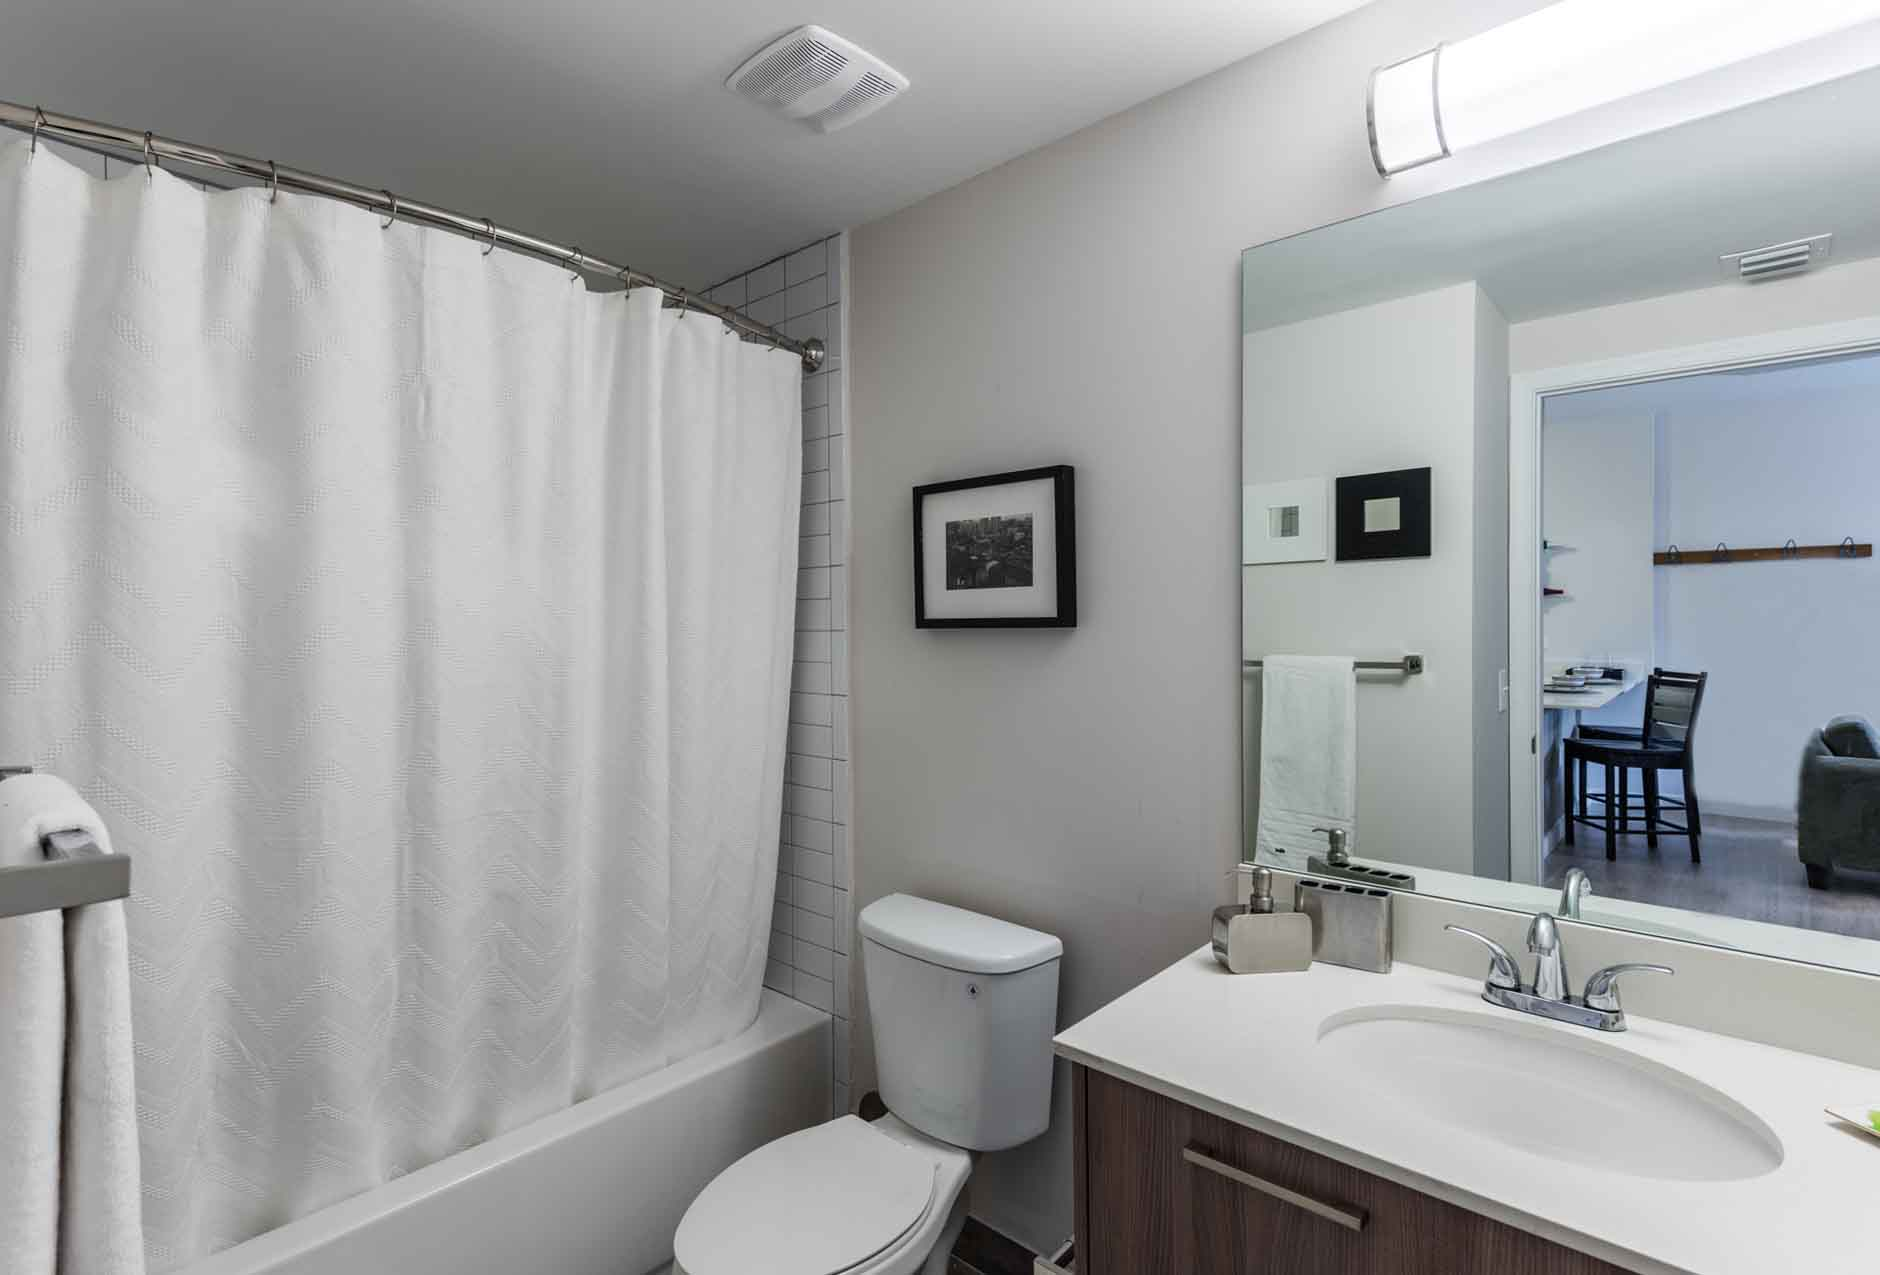 4th-Street-Commons-Miami-Bathroom-Unilodgers